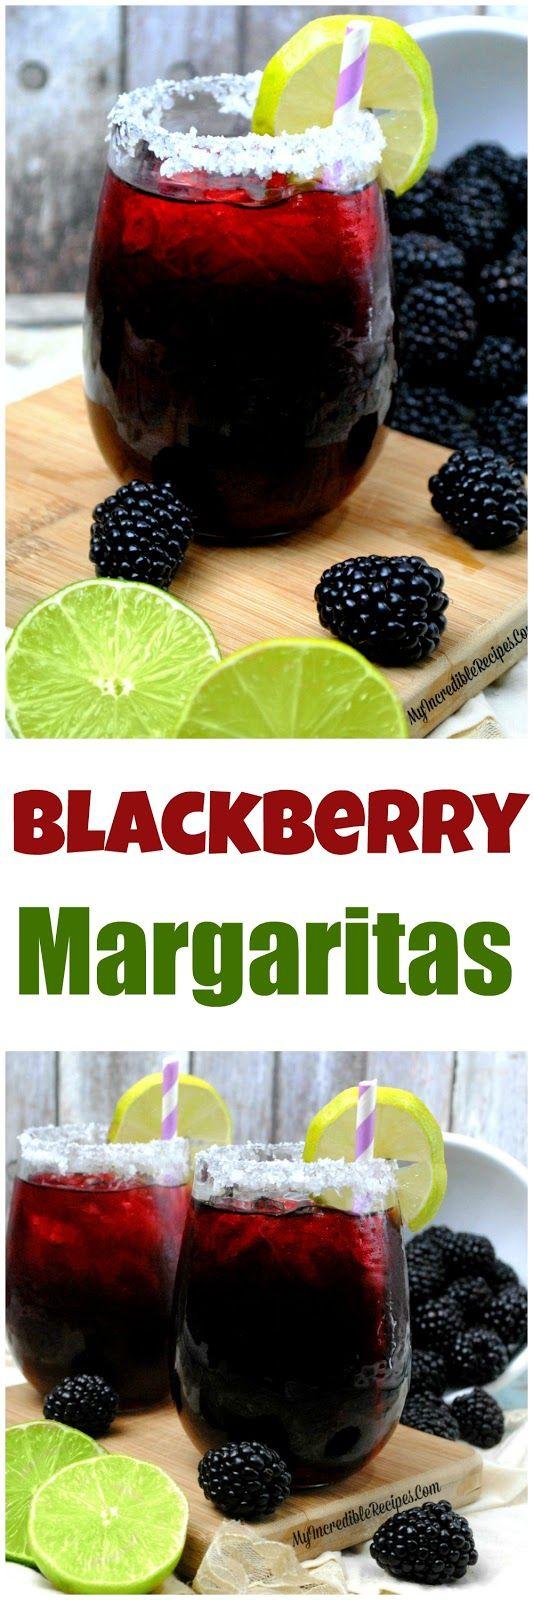 Ingredients 1 1/2oz Tequila 1/2oz Triple sec 1/2oz Cointreau 2 Tbsp. Blackberry simple syrup 1 cup Blackberries - pureed ...